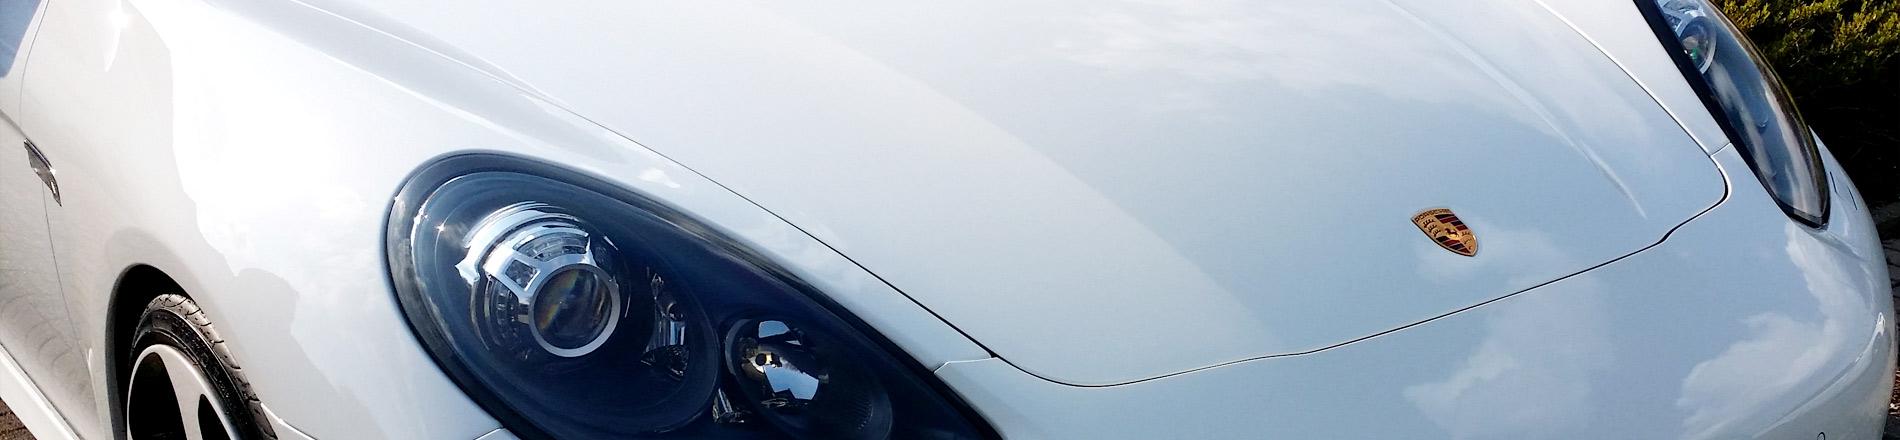 Glanz Fahrzeugaufbereitung Bergkamen | Lackpflege, Lackversiegelung